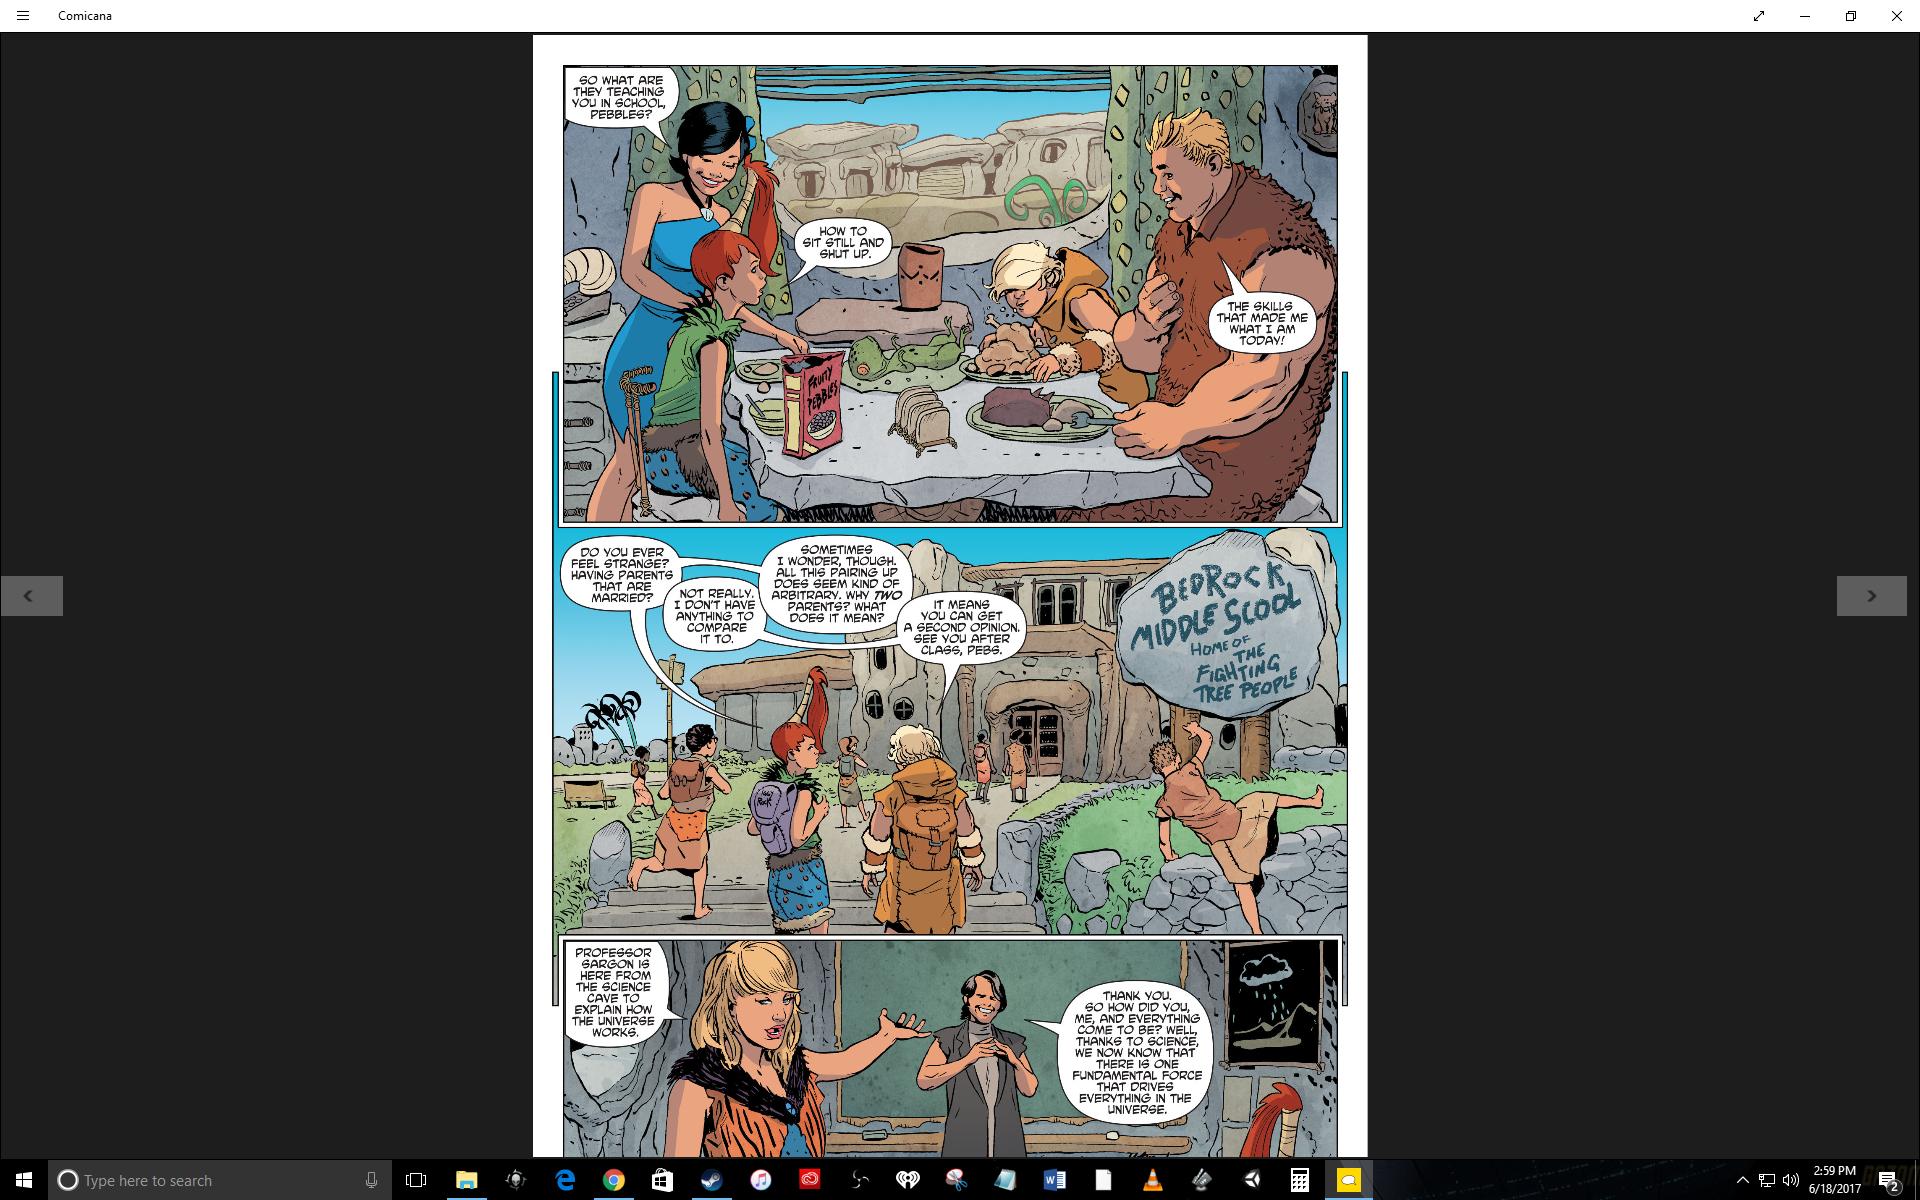 Furniture Puns Comic Reading Recommendation The Flintstones Volume 1